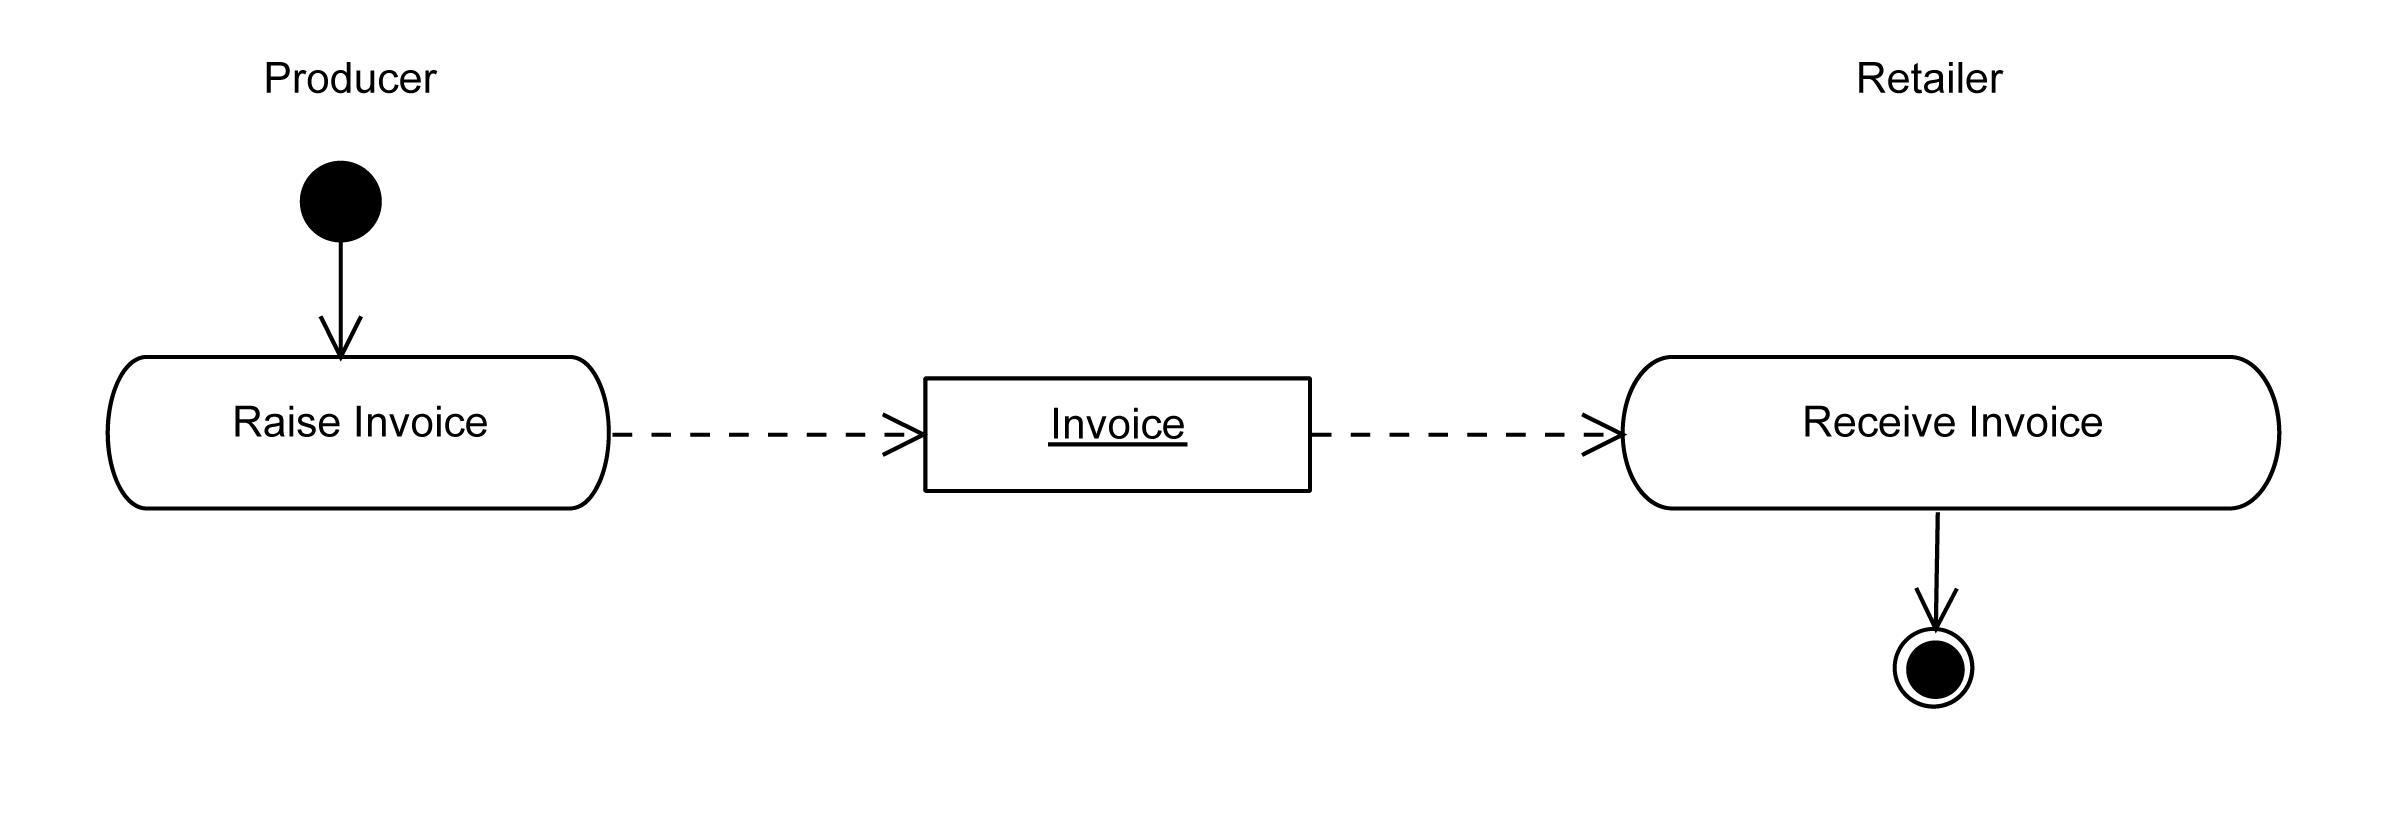 Universal Business Language Version 21